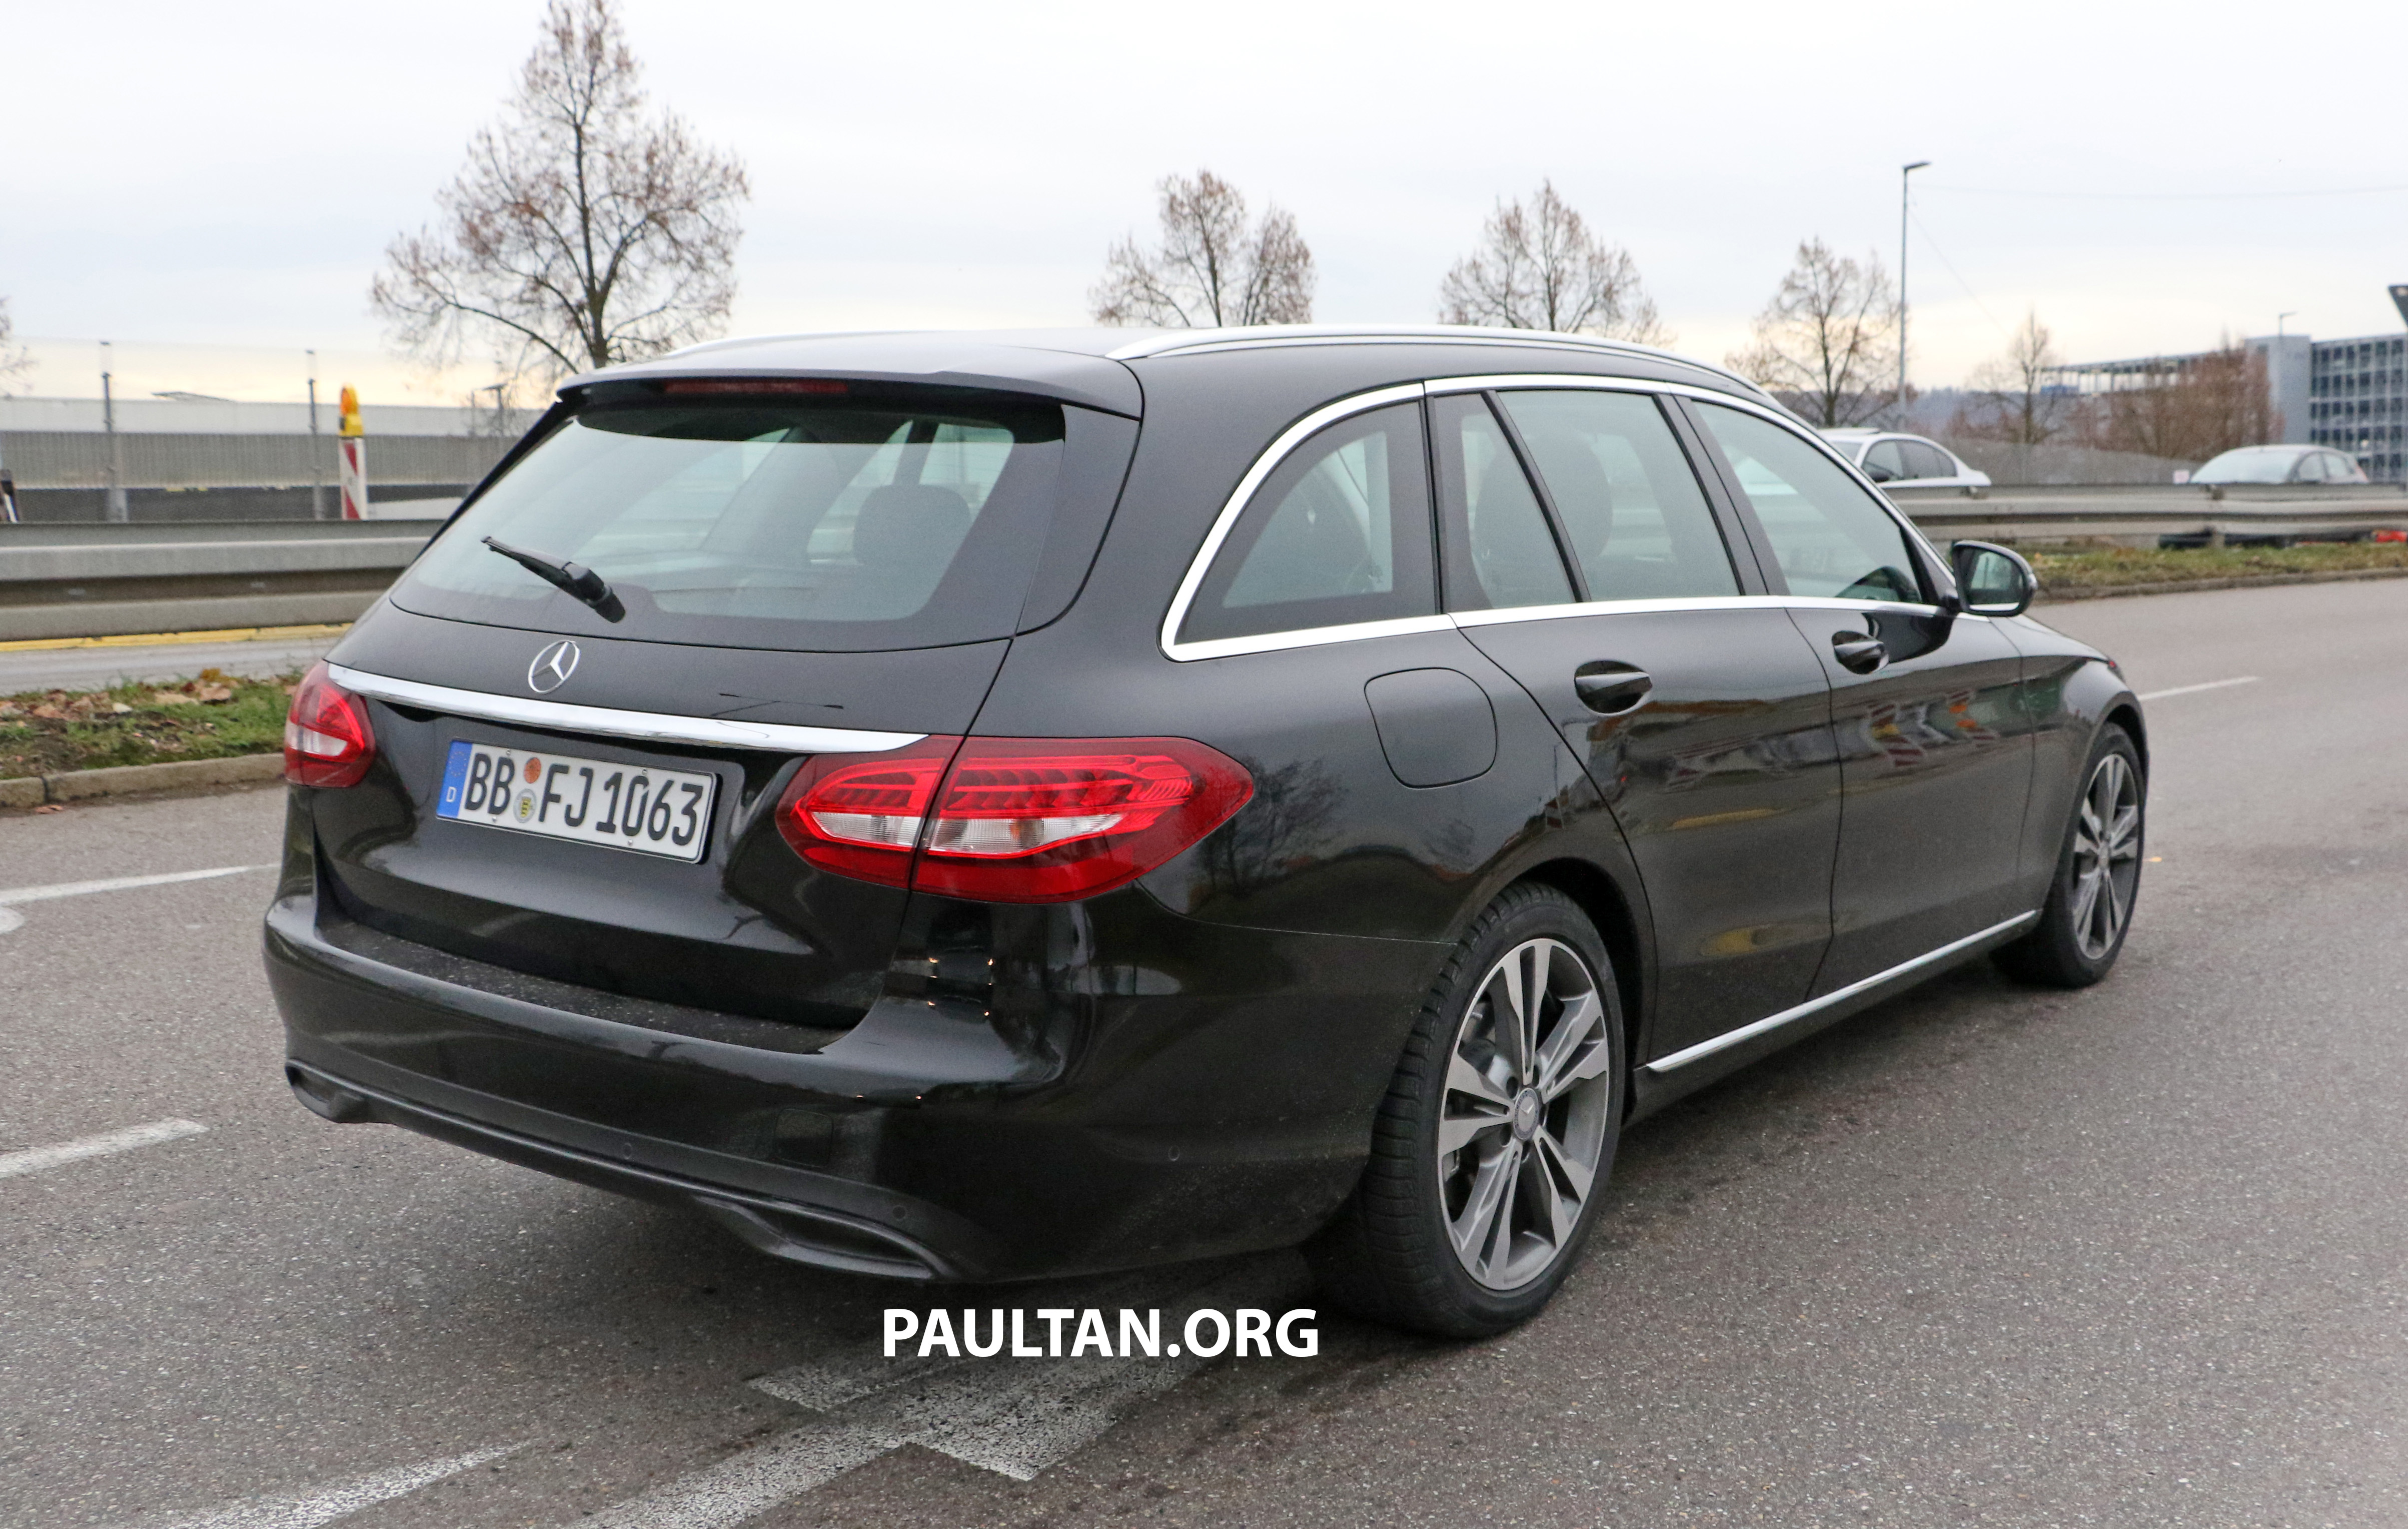 SPIED: W205 Mercedes C-Class facelift – interior seen Paul ...